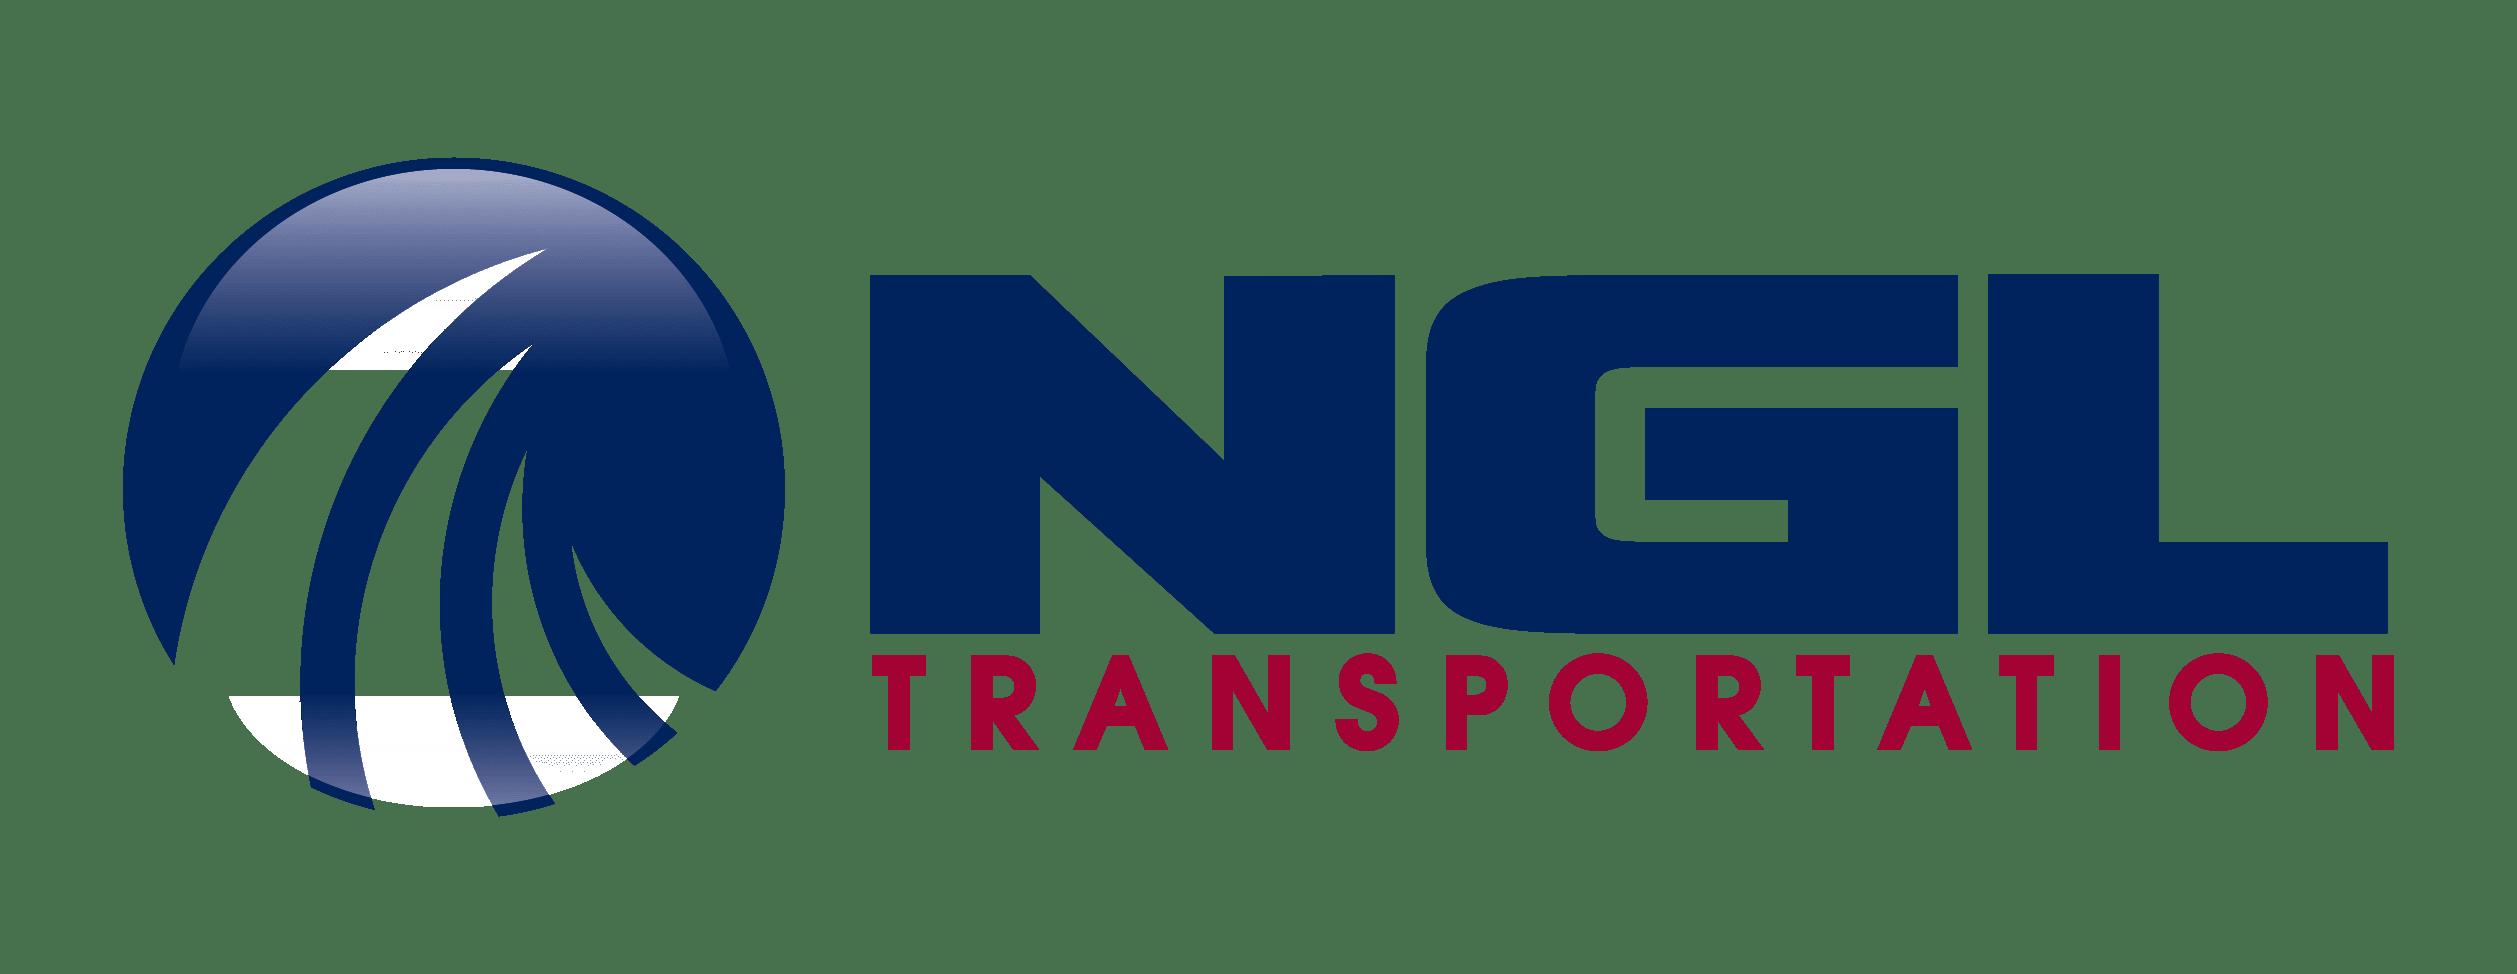 https://res.cloudinary.com/blue-cargo/images/f_auto,q_auto/v1623458400/ngl-transportation-1/ngl-transportation-1.png